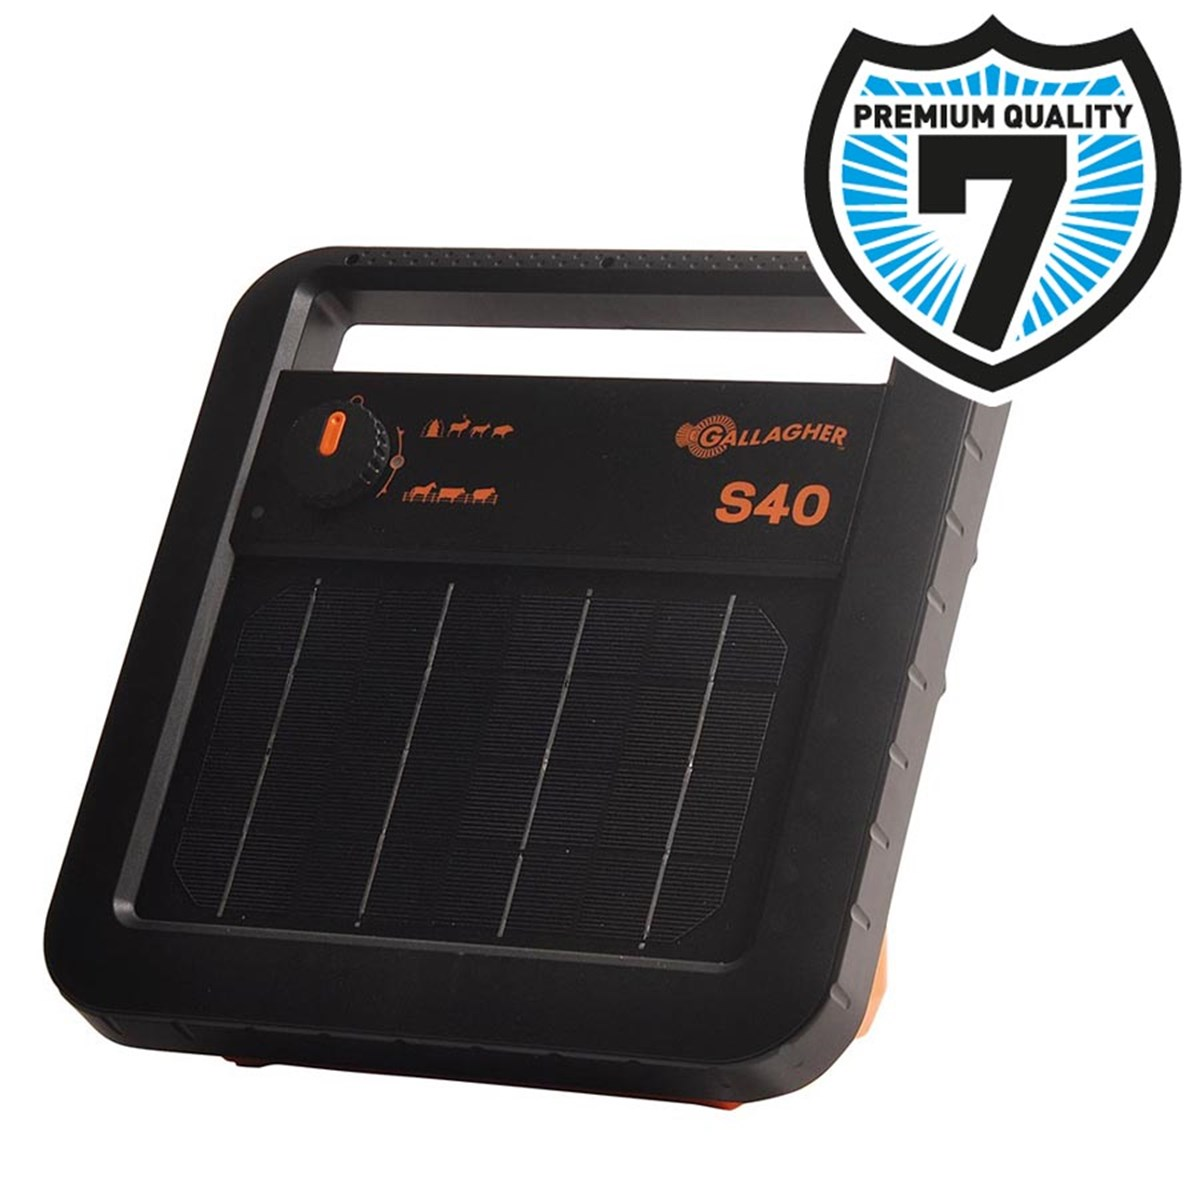 Gallagher s40 inclusief batterij (6v - 0